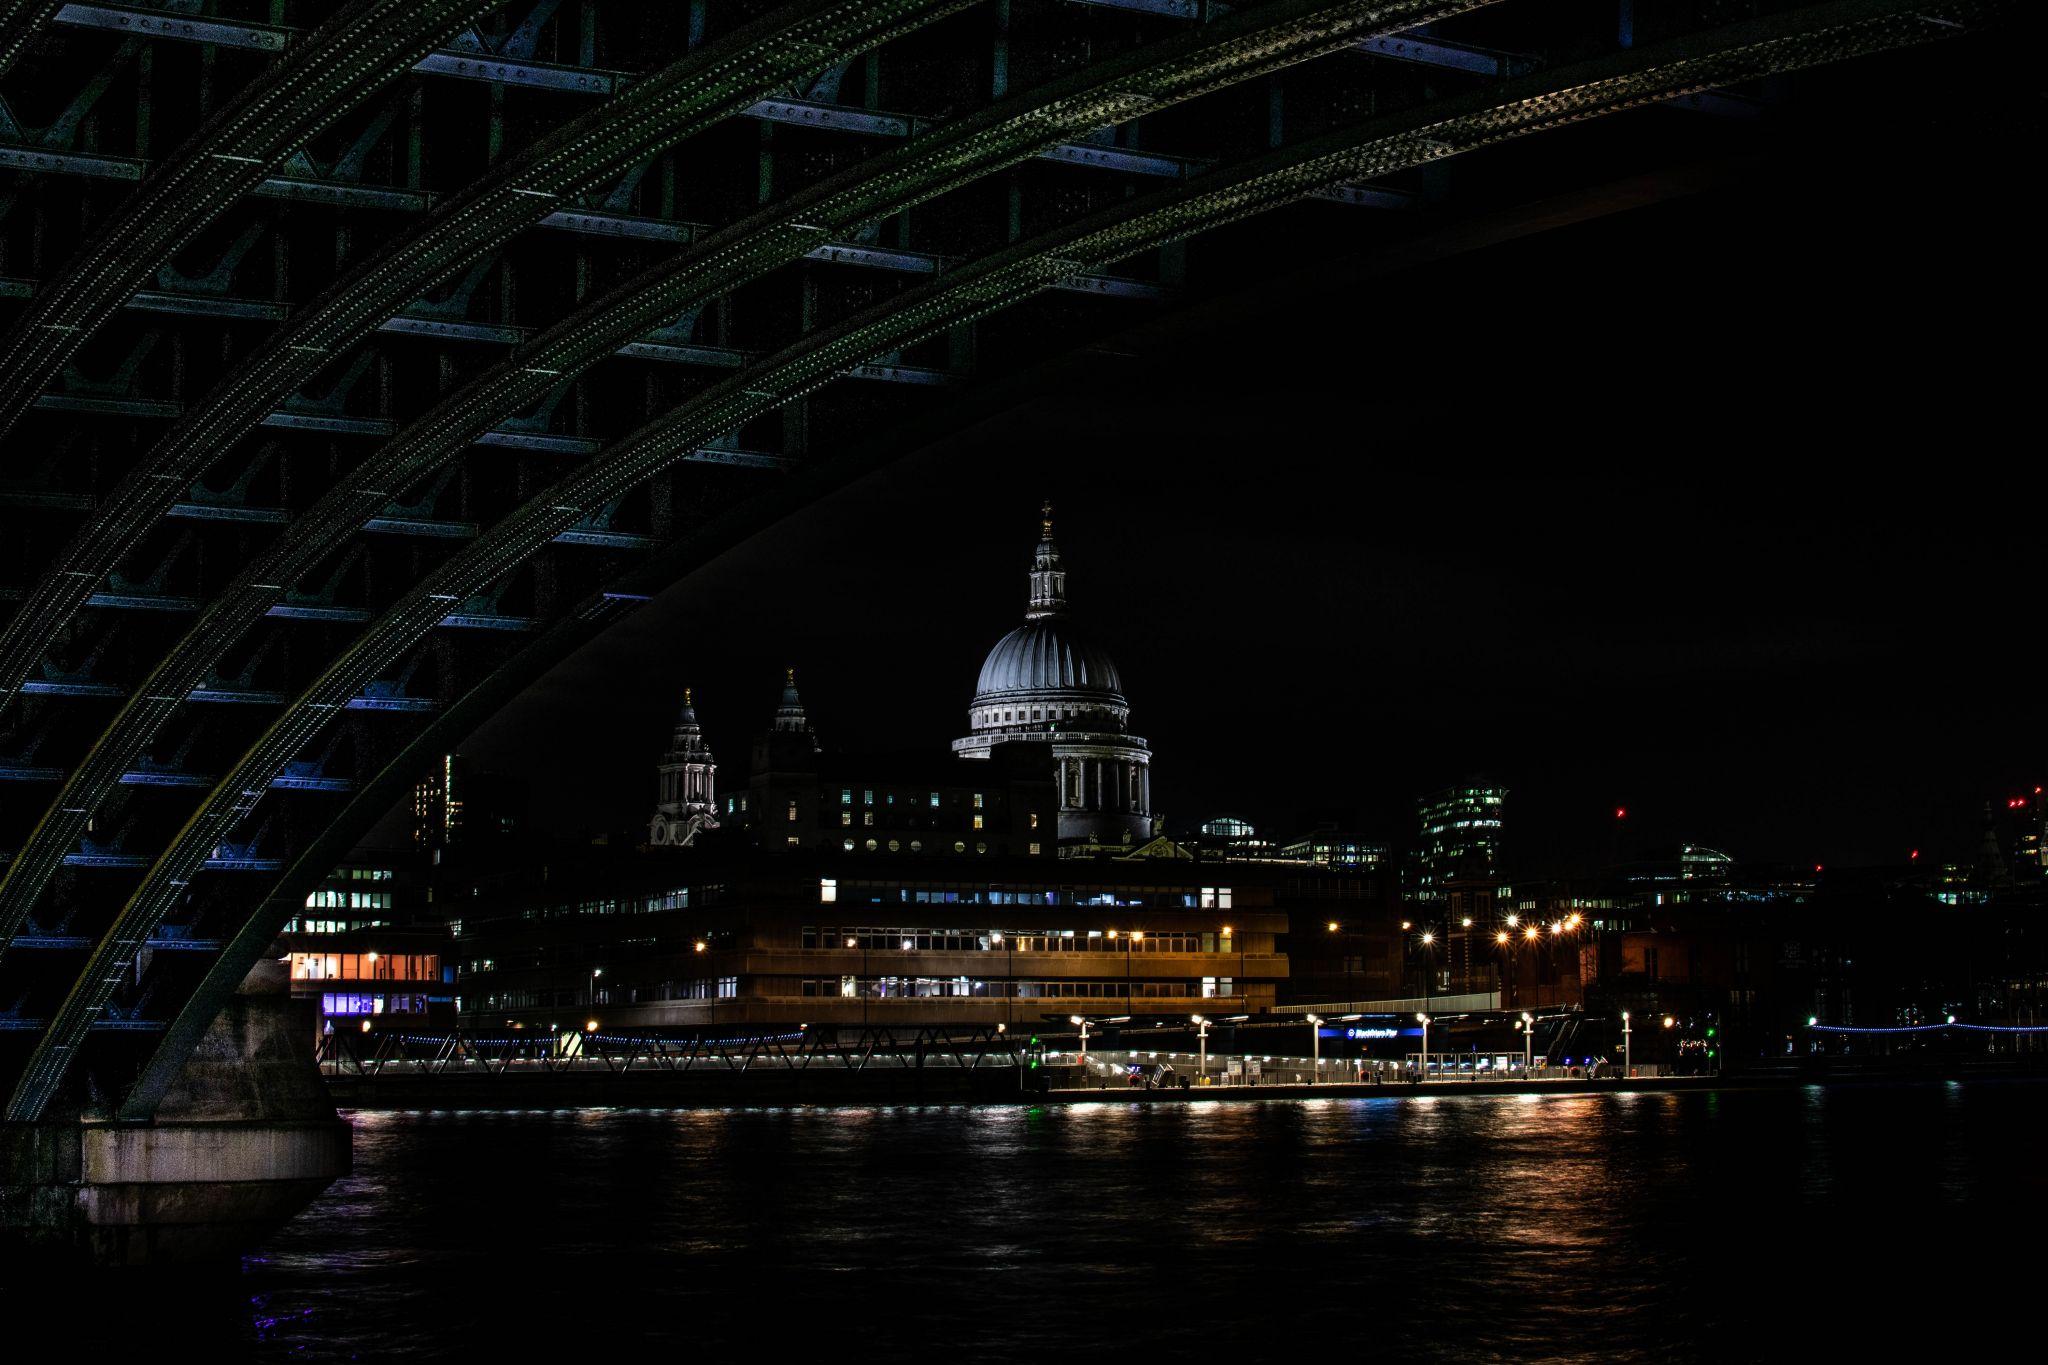 Under Blackfriars Bridge, United Kingdom